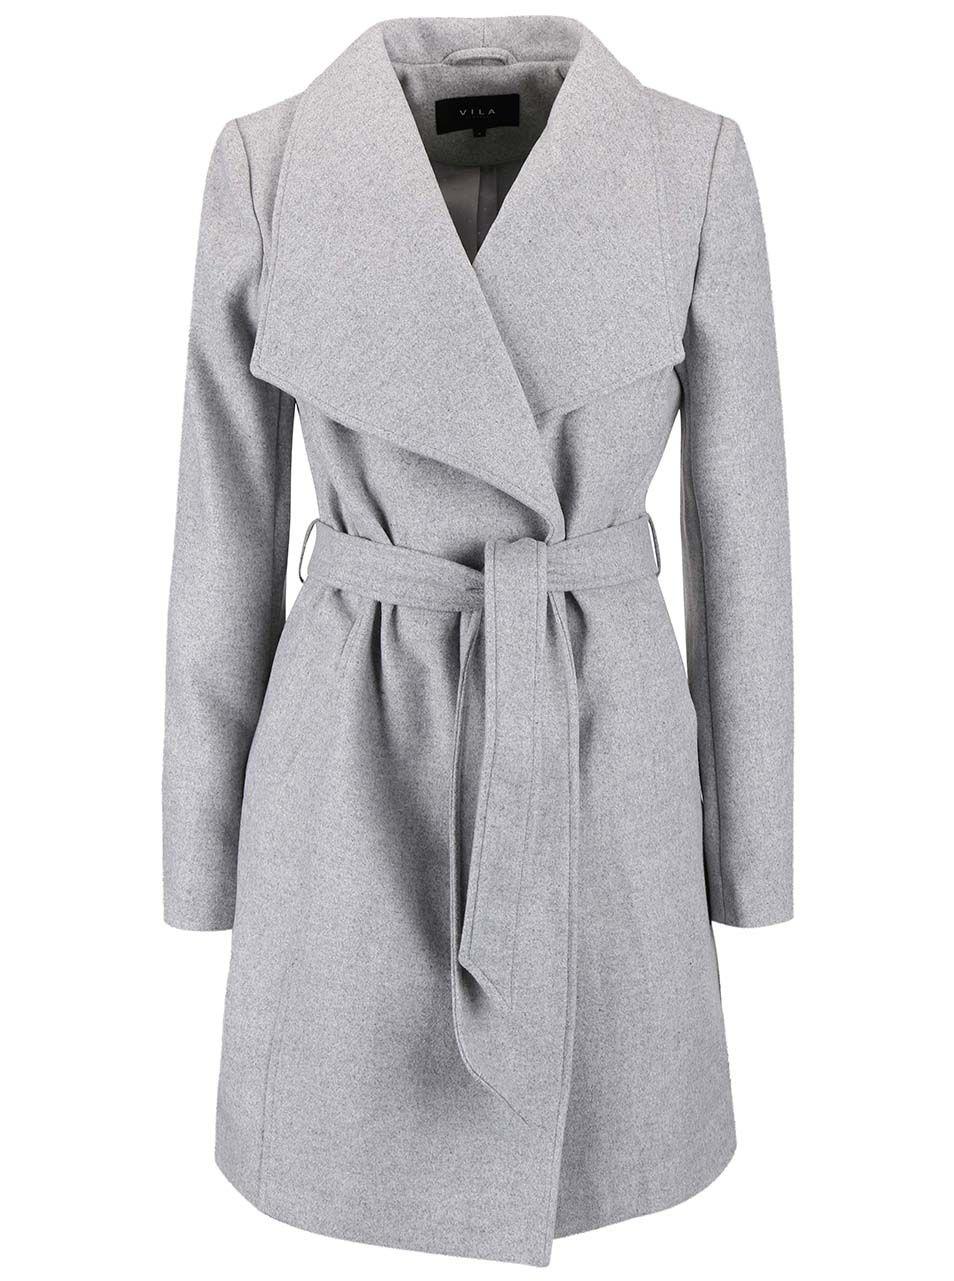 ccbc13825e Světle šedý kabát s páskem VILA Director Vila, Fashion, Vero Moda, Dress,